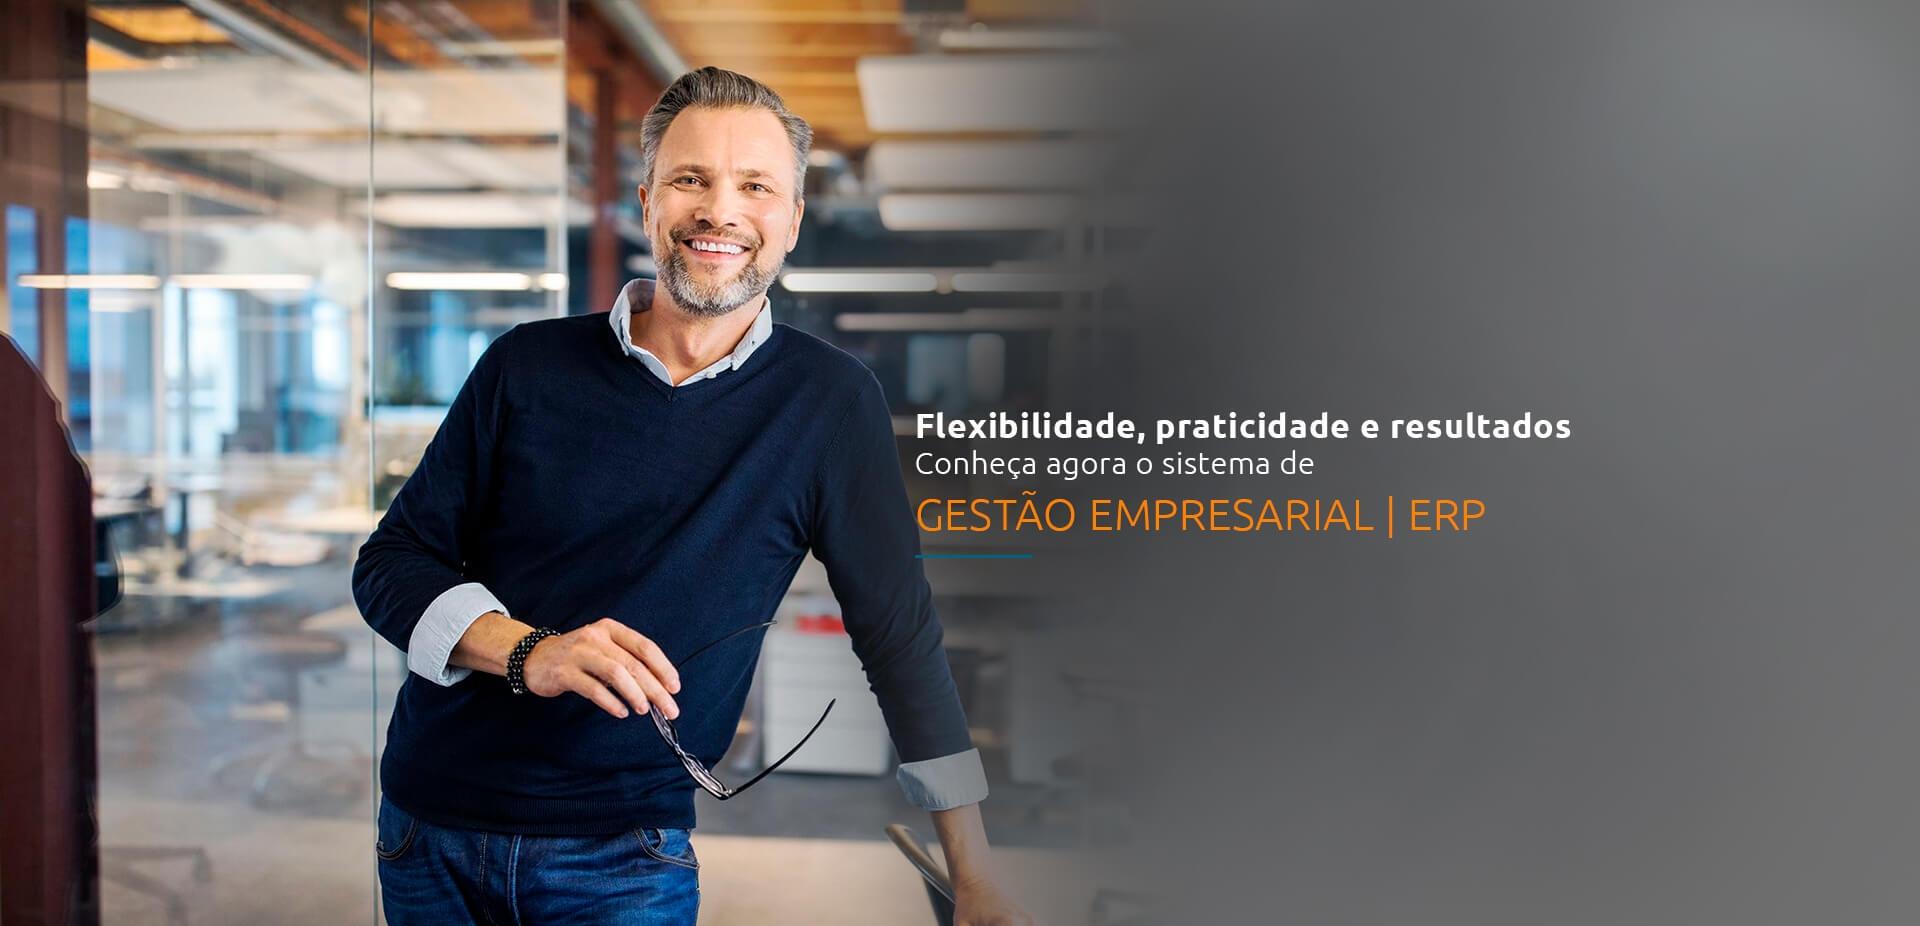 Banner 3 - Sistema de Gestão Empresarial